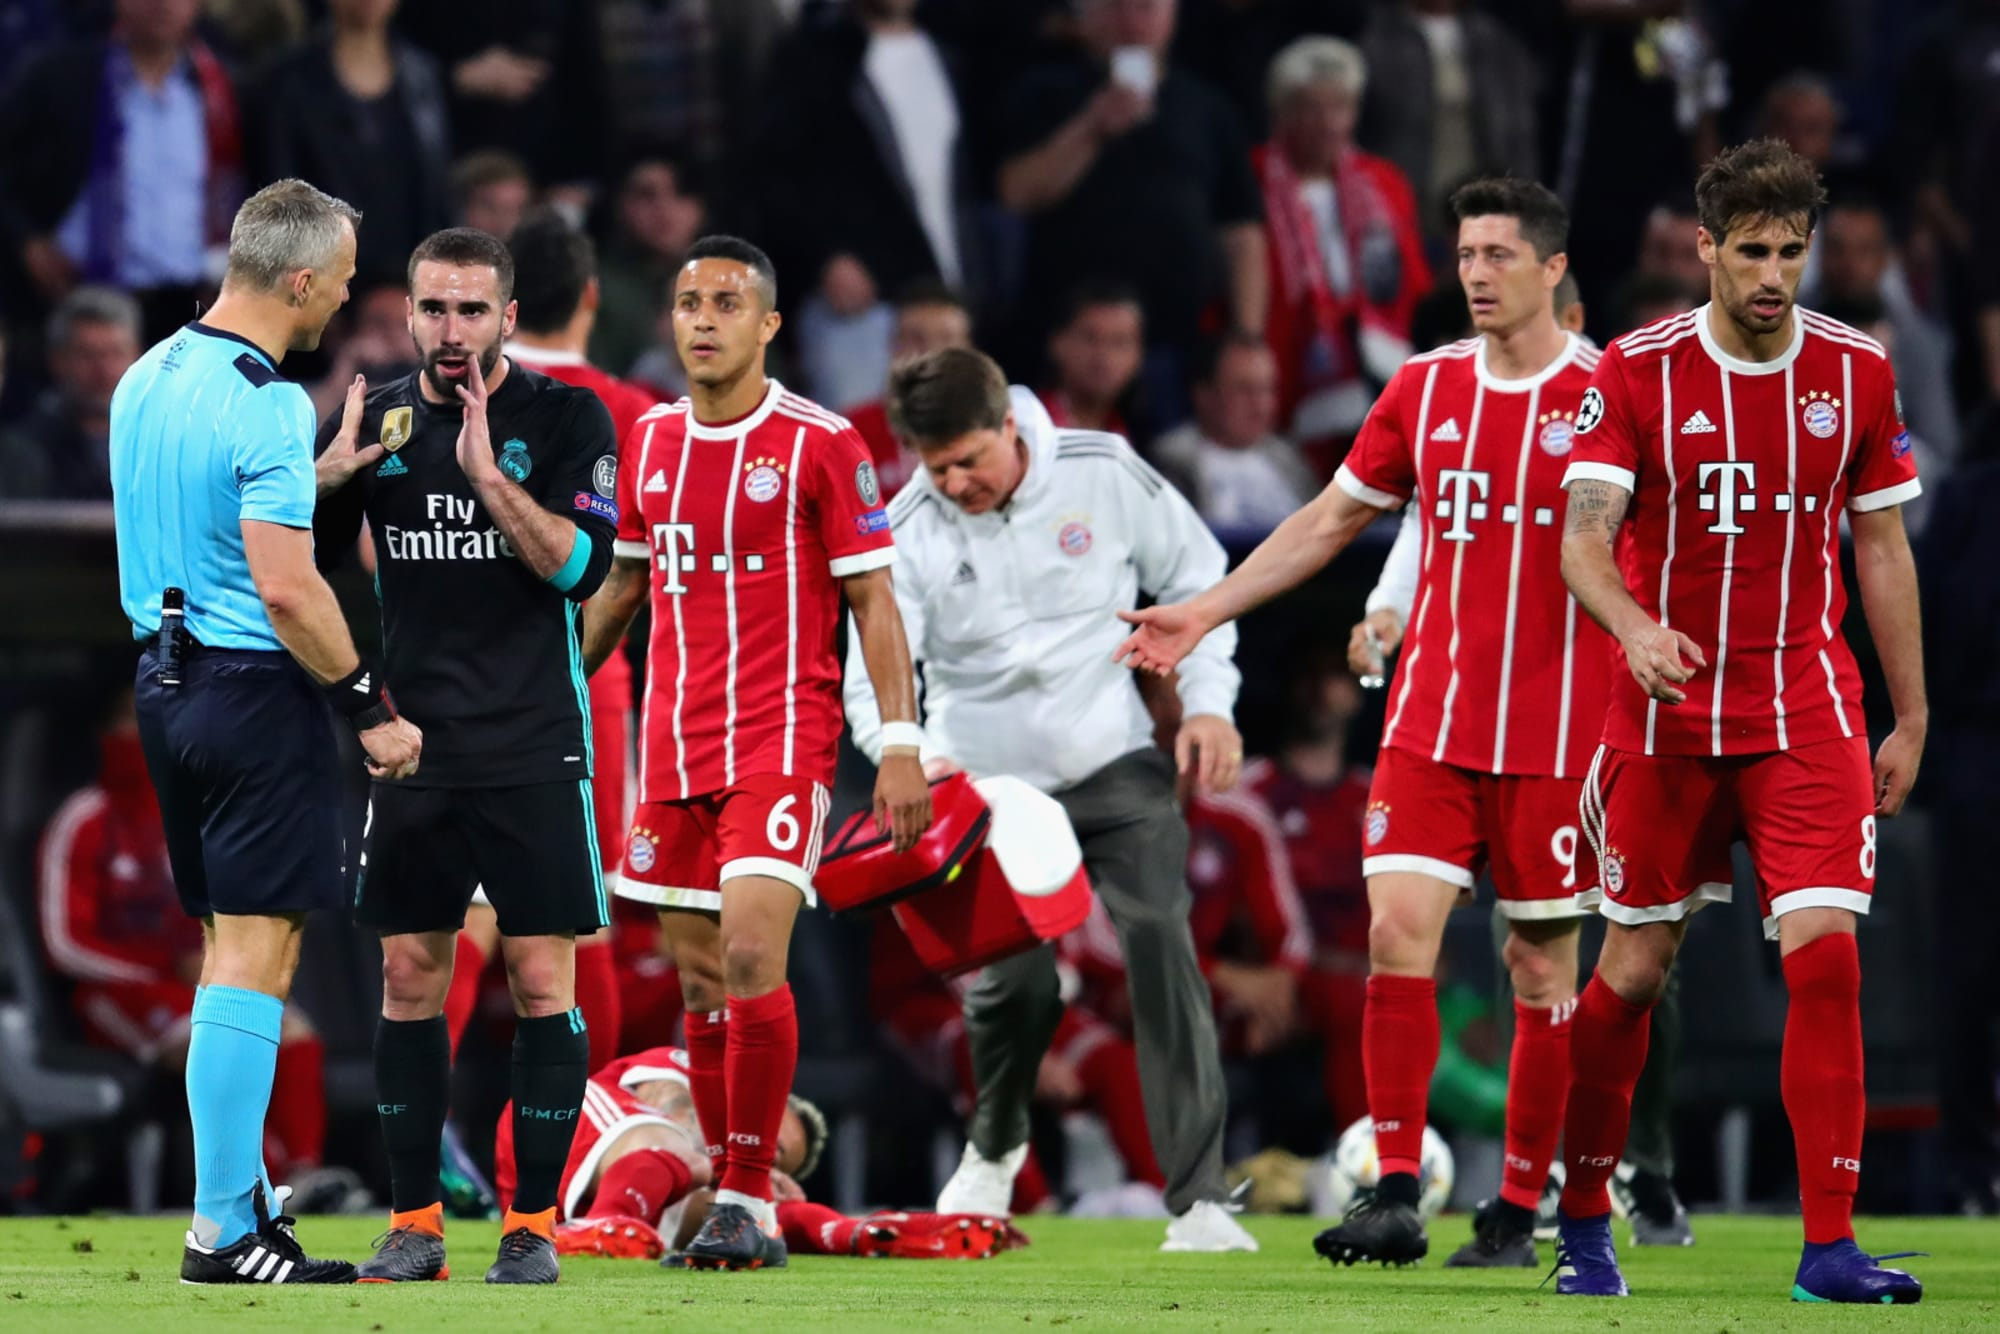 München Real